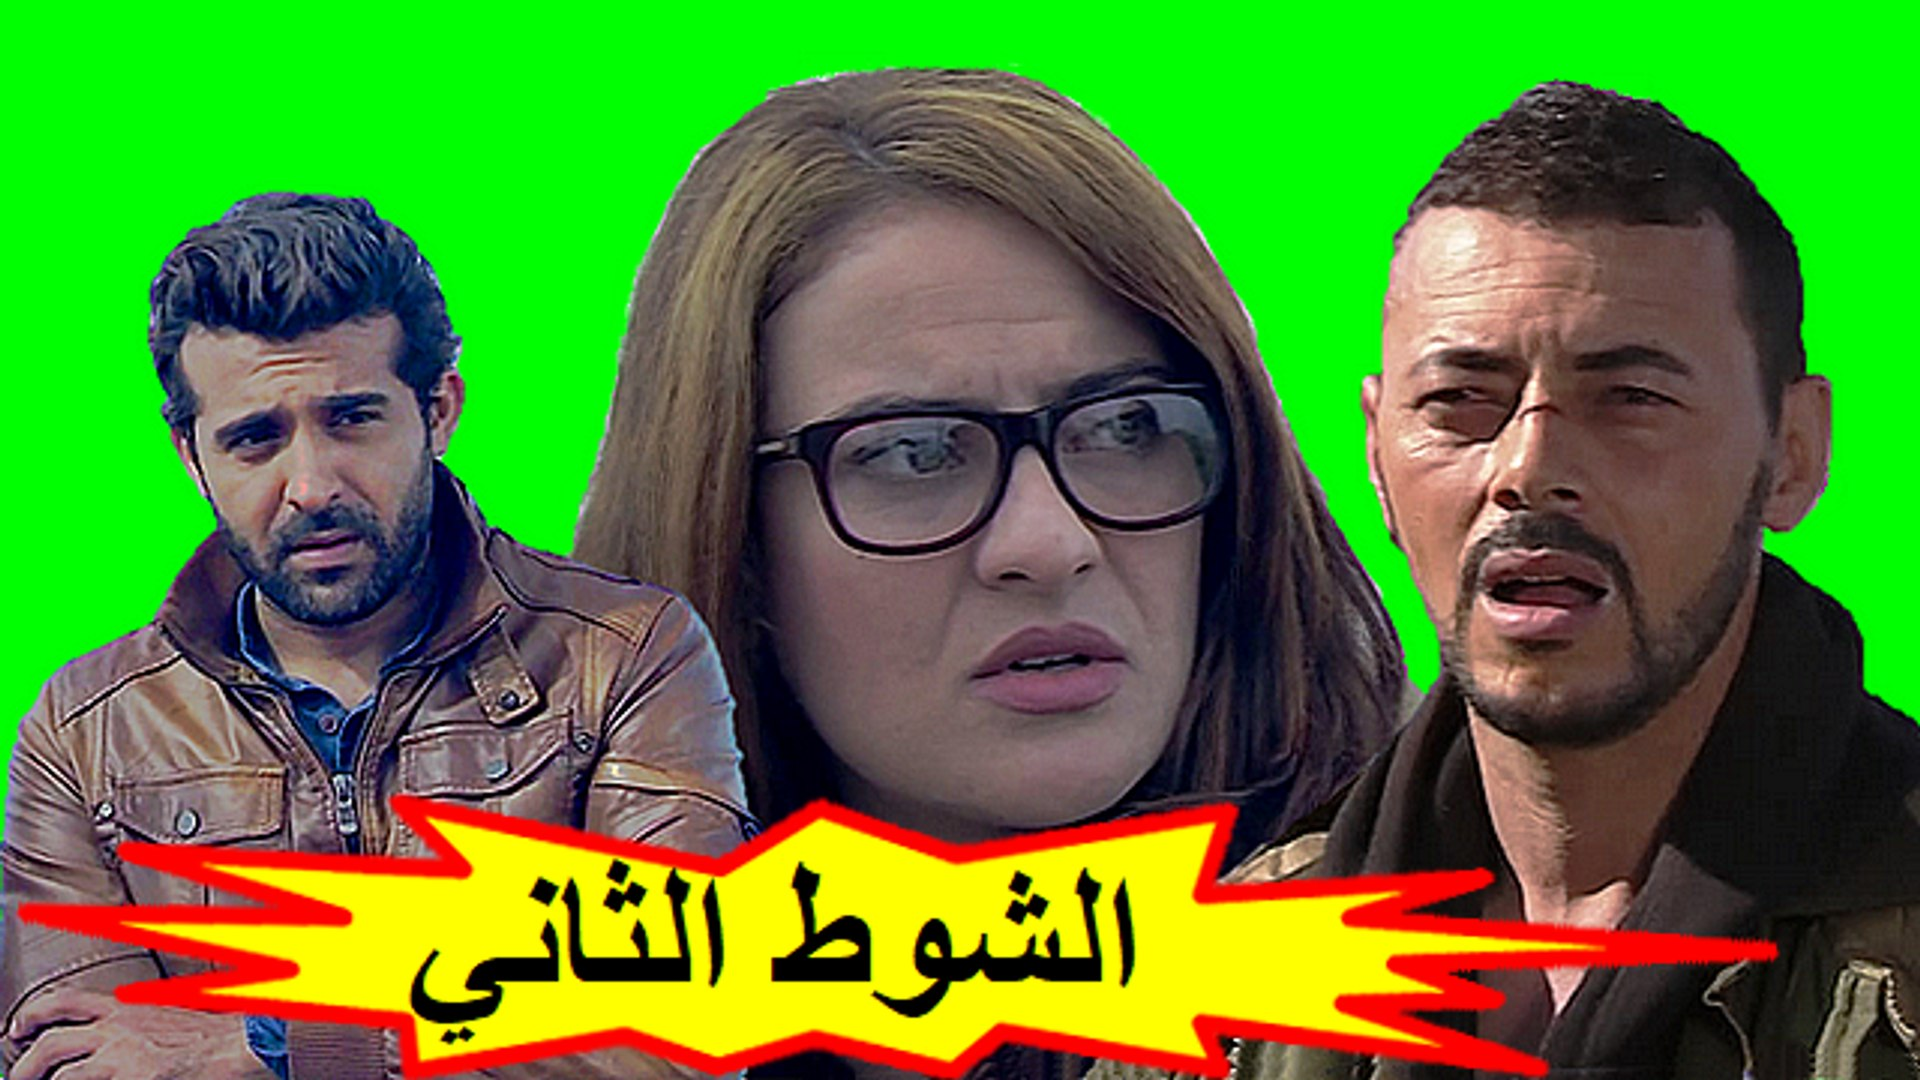 HD فيلم الأكشن المغربي - الشوط الثاني - الفصل الأول  شاشة كاملة